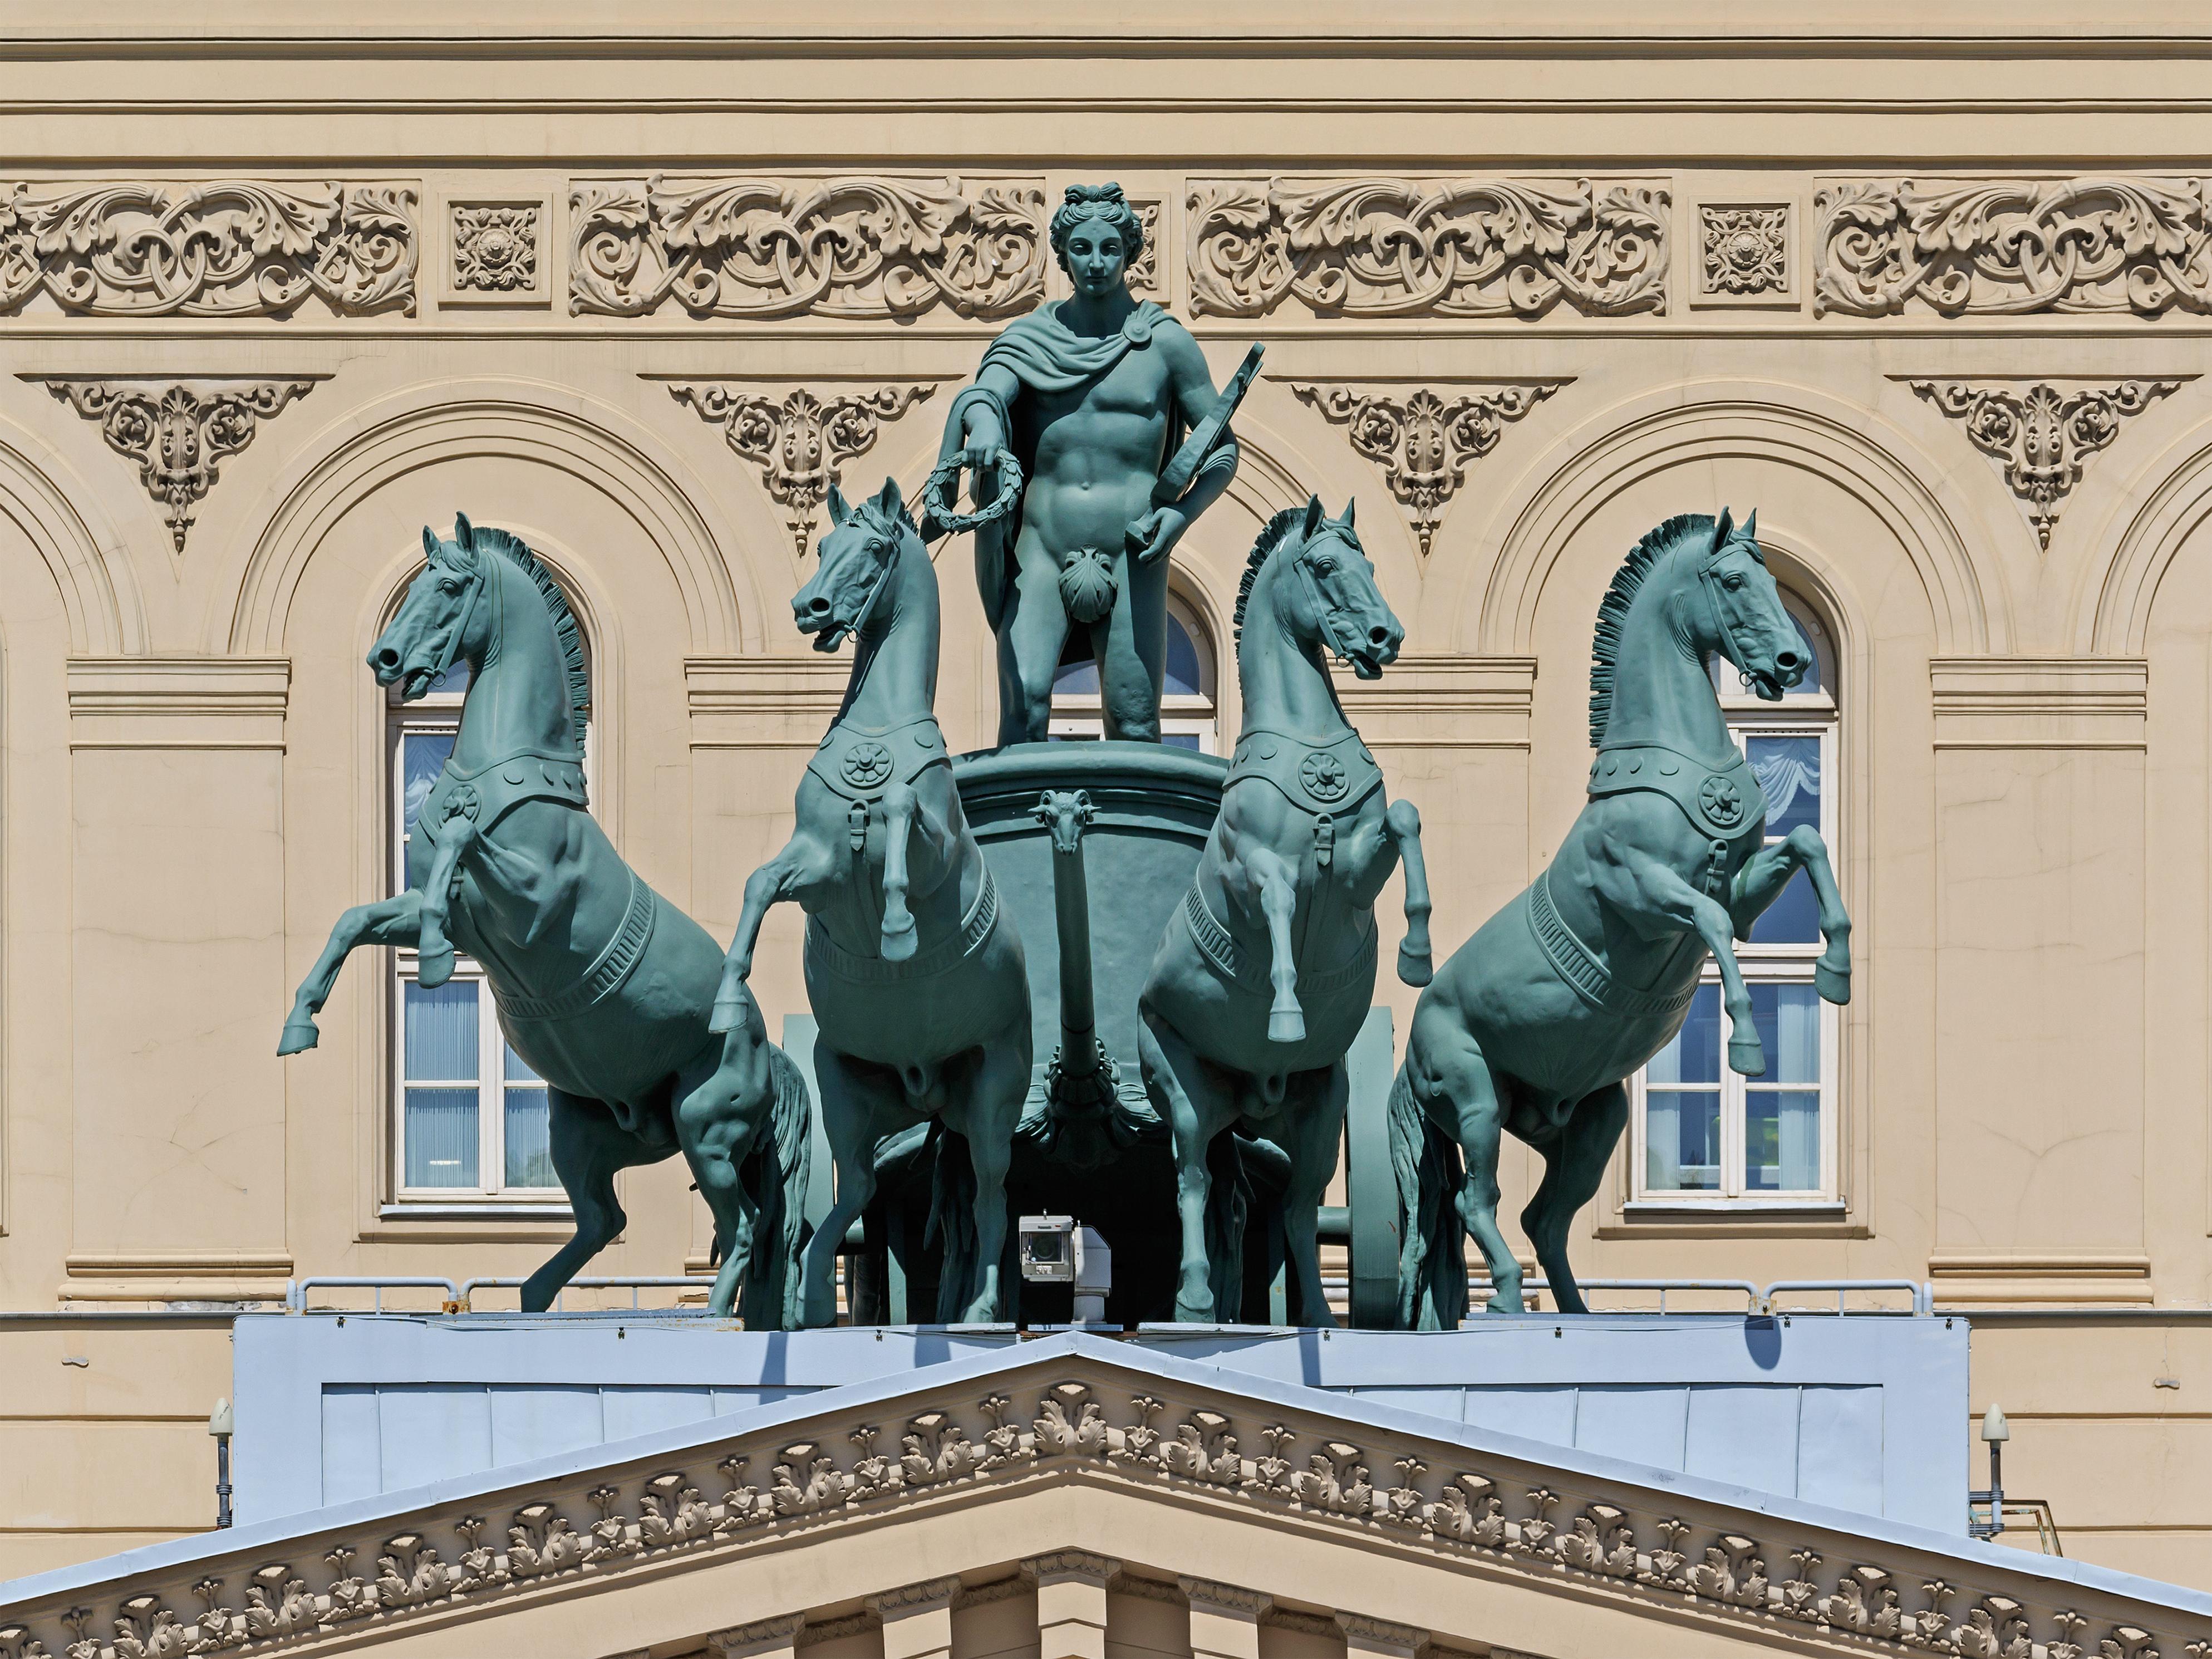 https://upload.wikimedia.org/wikipedia/commons/b/b8/Moscow_05-2017_img27_Bolshoy_Theatre_quadriga.jpg